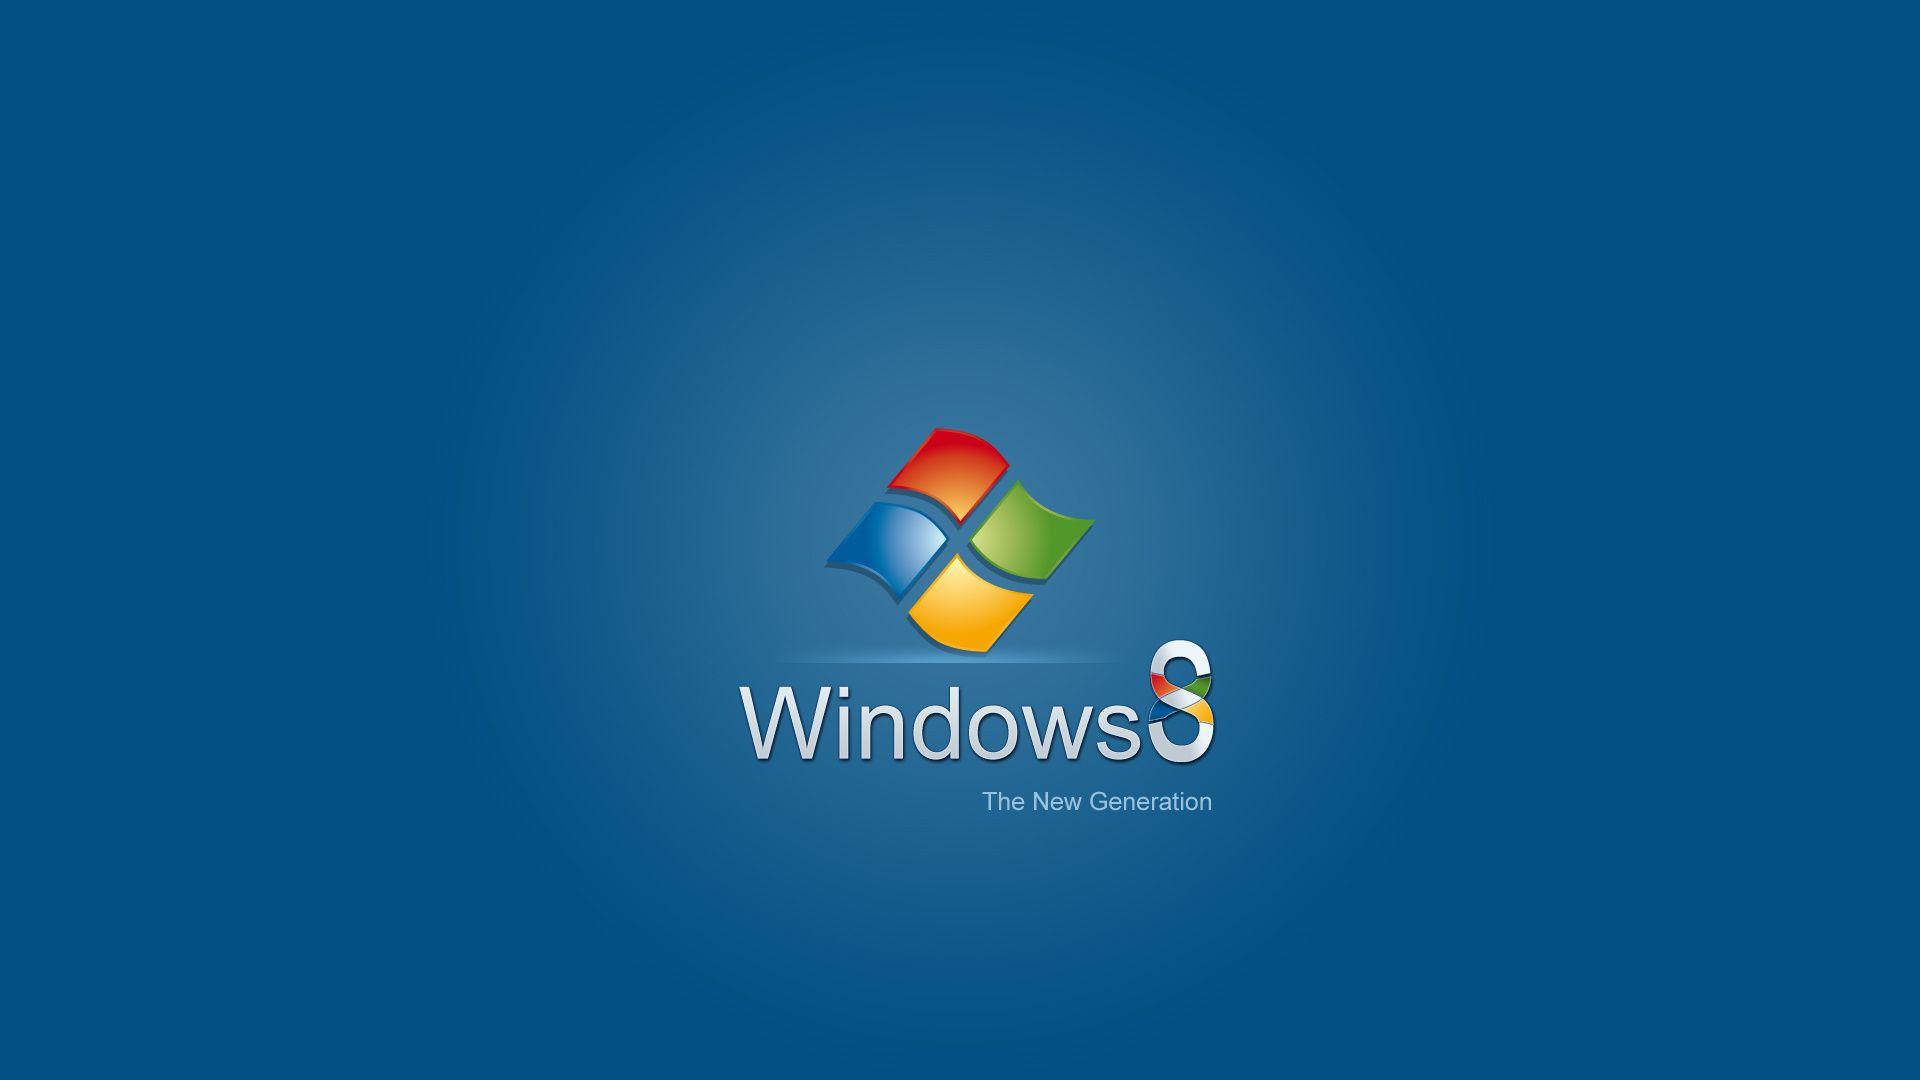 Windows 8 Official 1080p Hd Wallpaper 1080p Hd Wallpapers Geo Wallpaper Black Wallpaper Iphone Hd Wallpapers 1080p